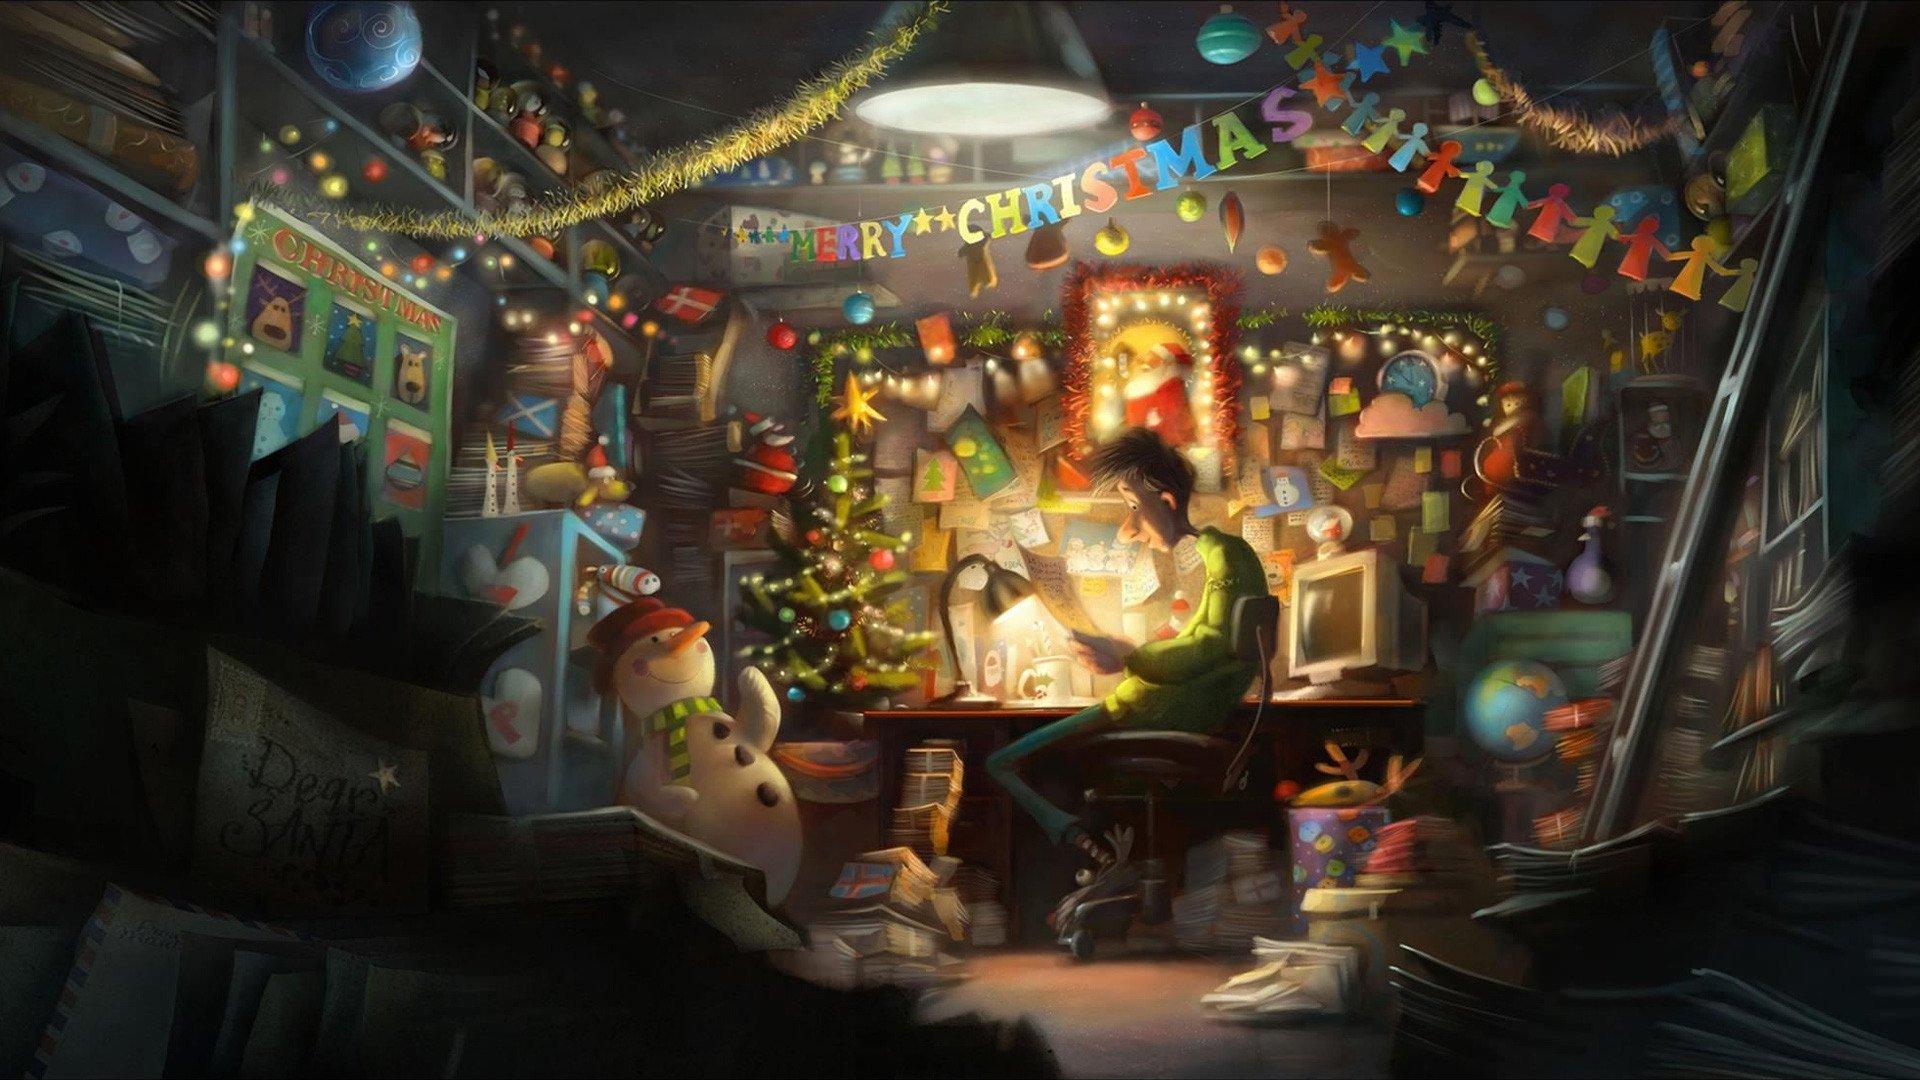 Arthur Christmas HD Wallpaper Background Image 1920x1080 ID 1920x1080